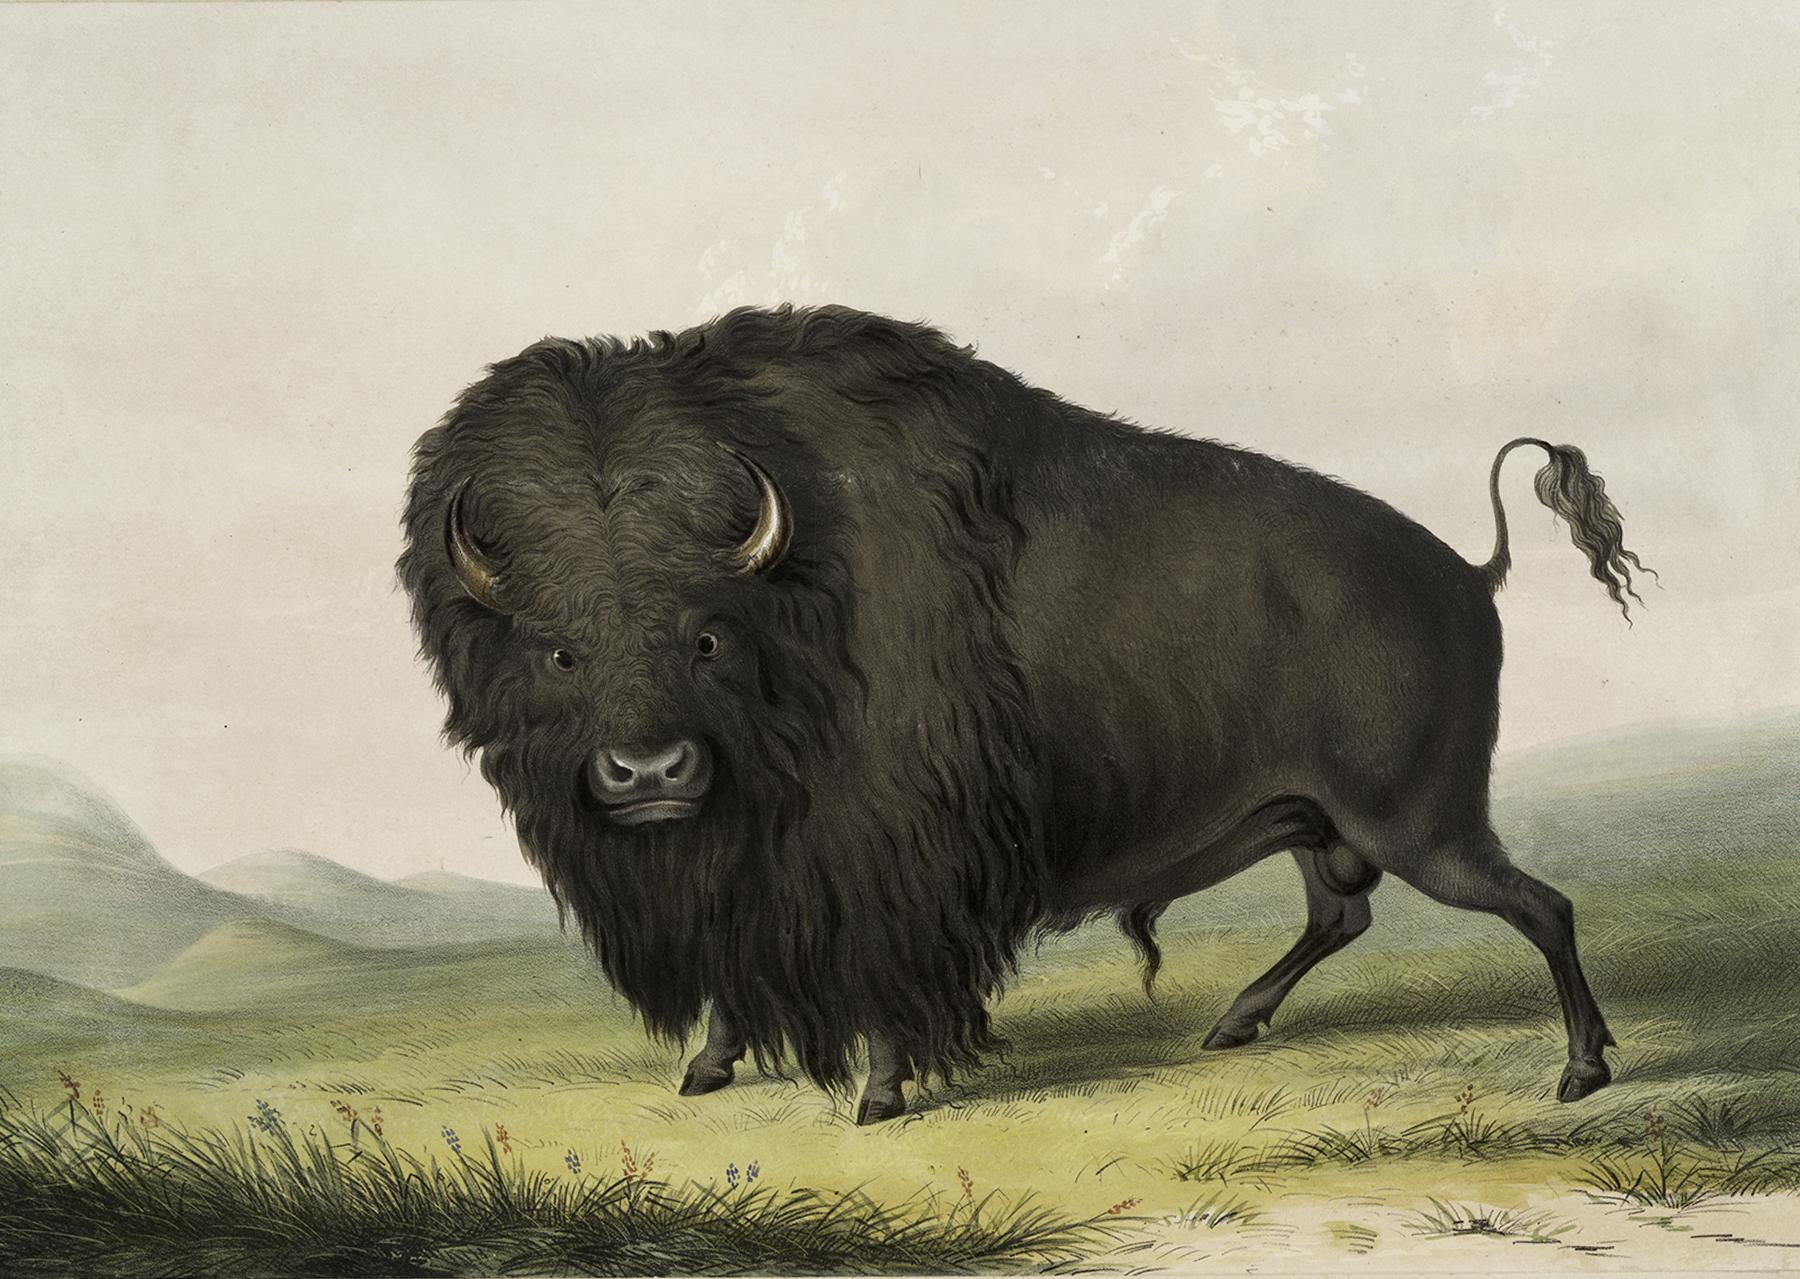 Vintage Buffalo Image